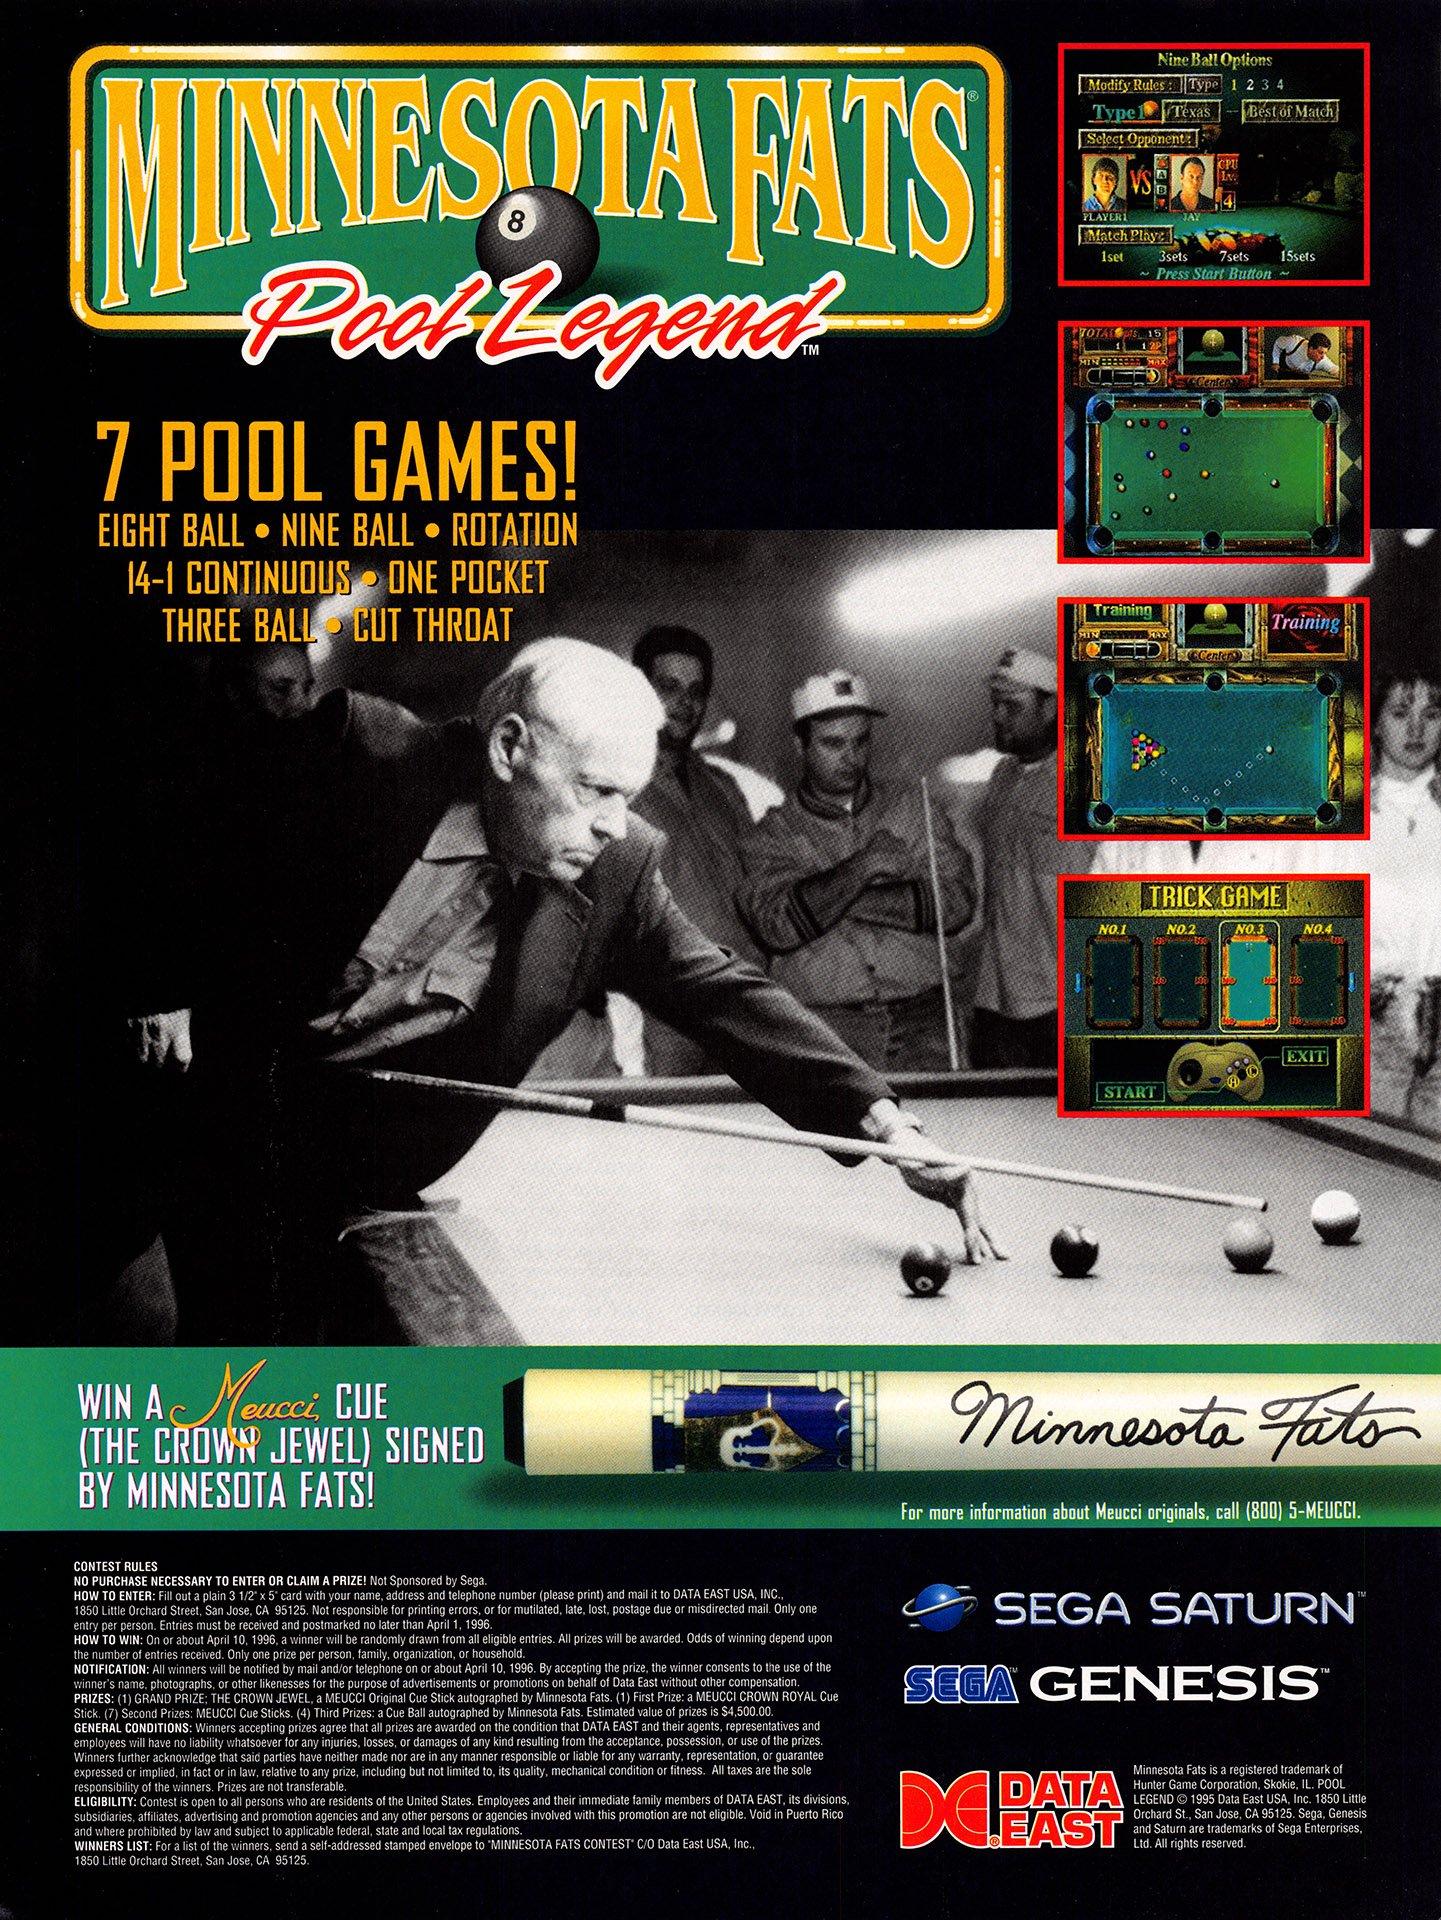 Minnesota Fats Pool Legend